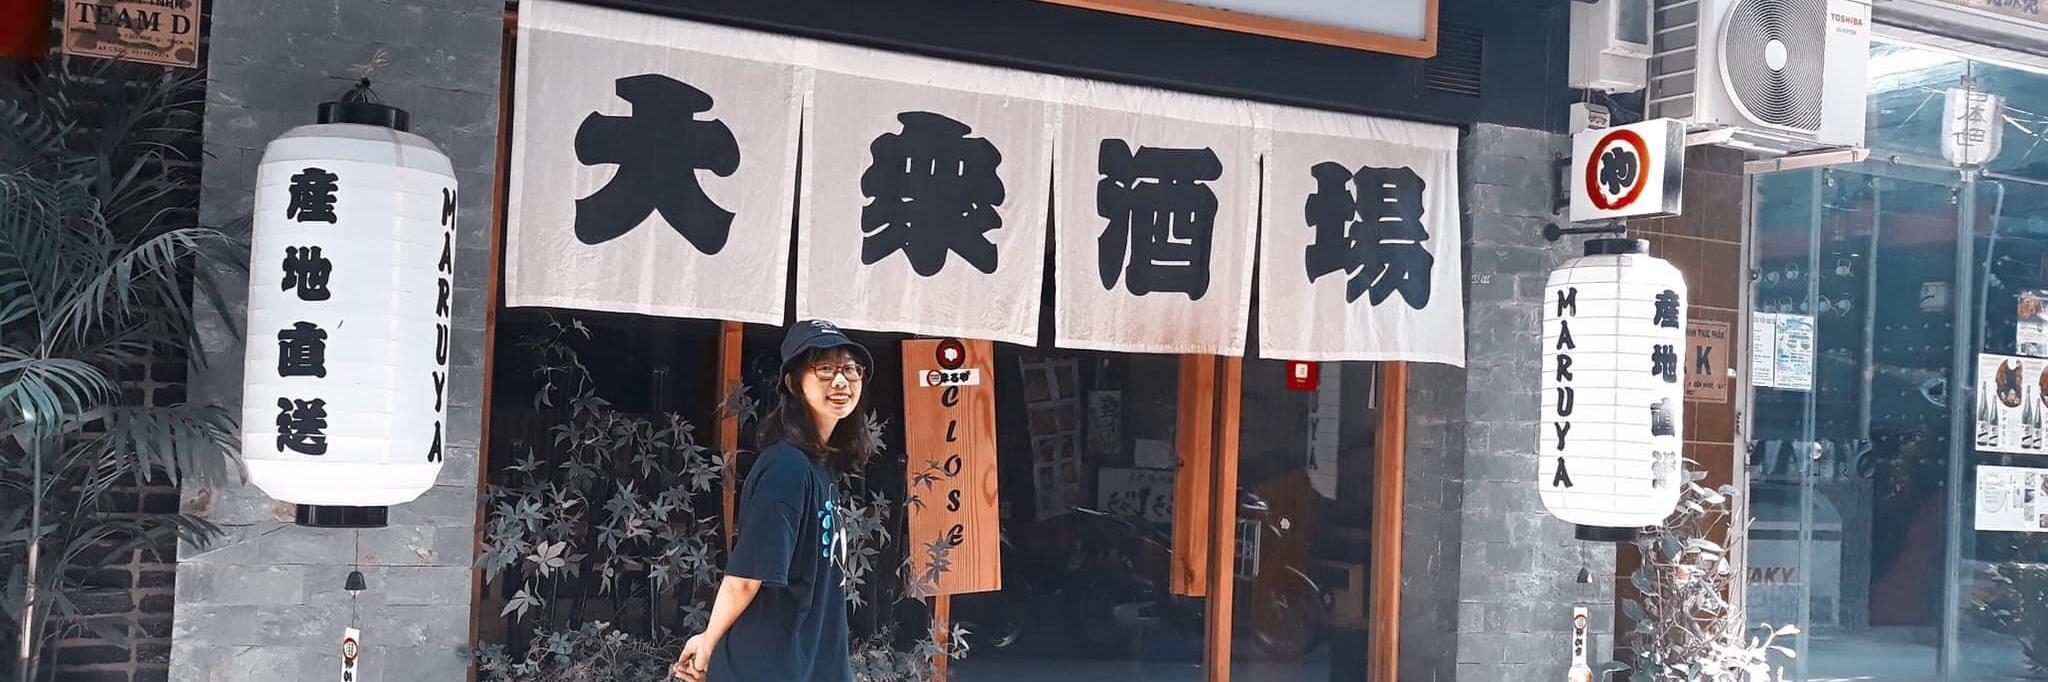 https://gody.vn/blog/congchua_mauhong803174/post/khu-pho-nhat-sieu-chat-o-sai-gon-9007